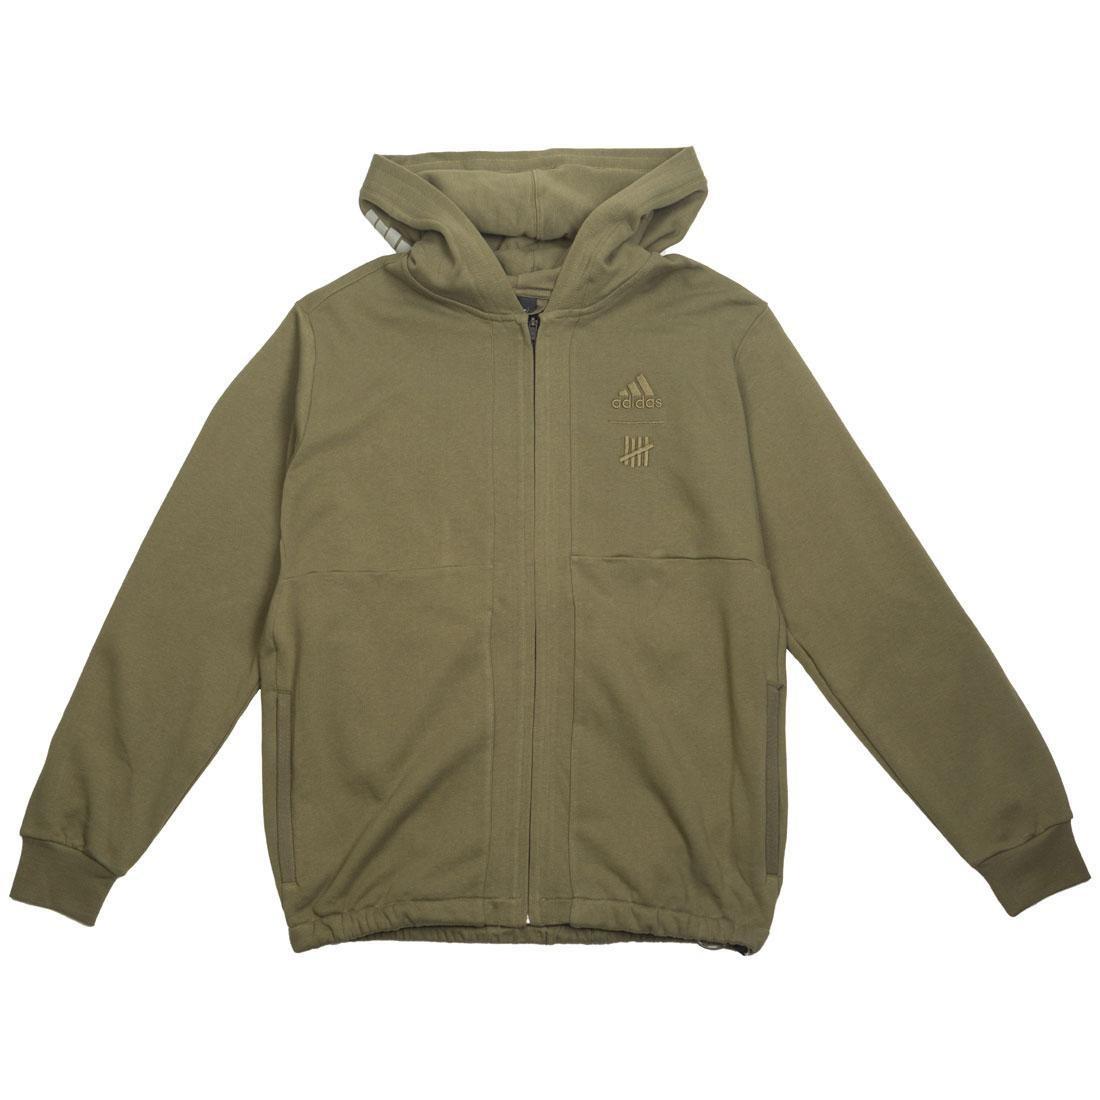 Adidas x Undefeated Men FZ Hoodie (olive / olive cargo)